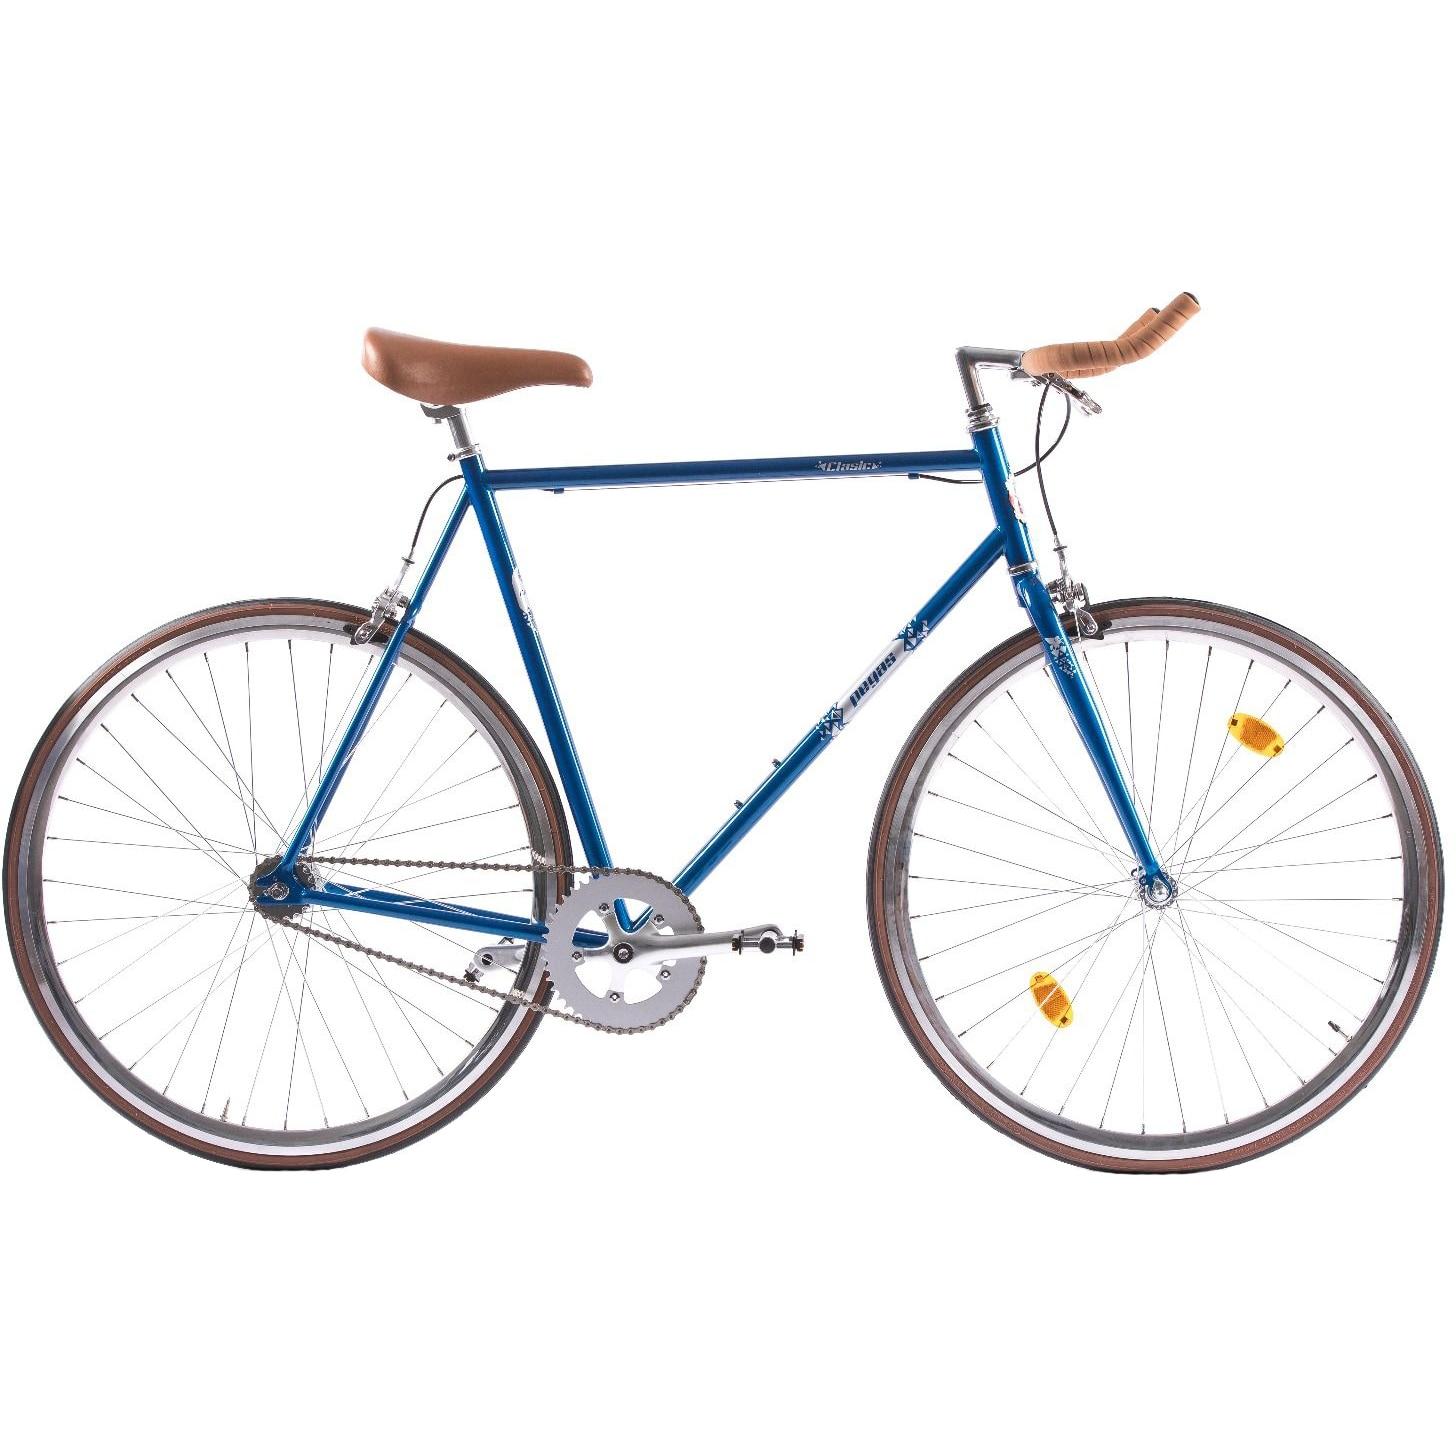 Fotografie Bicicleta Pegas Clasic 2S, Bullhorn Man, 61cm, Bleu